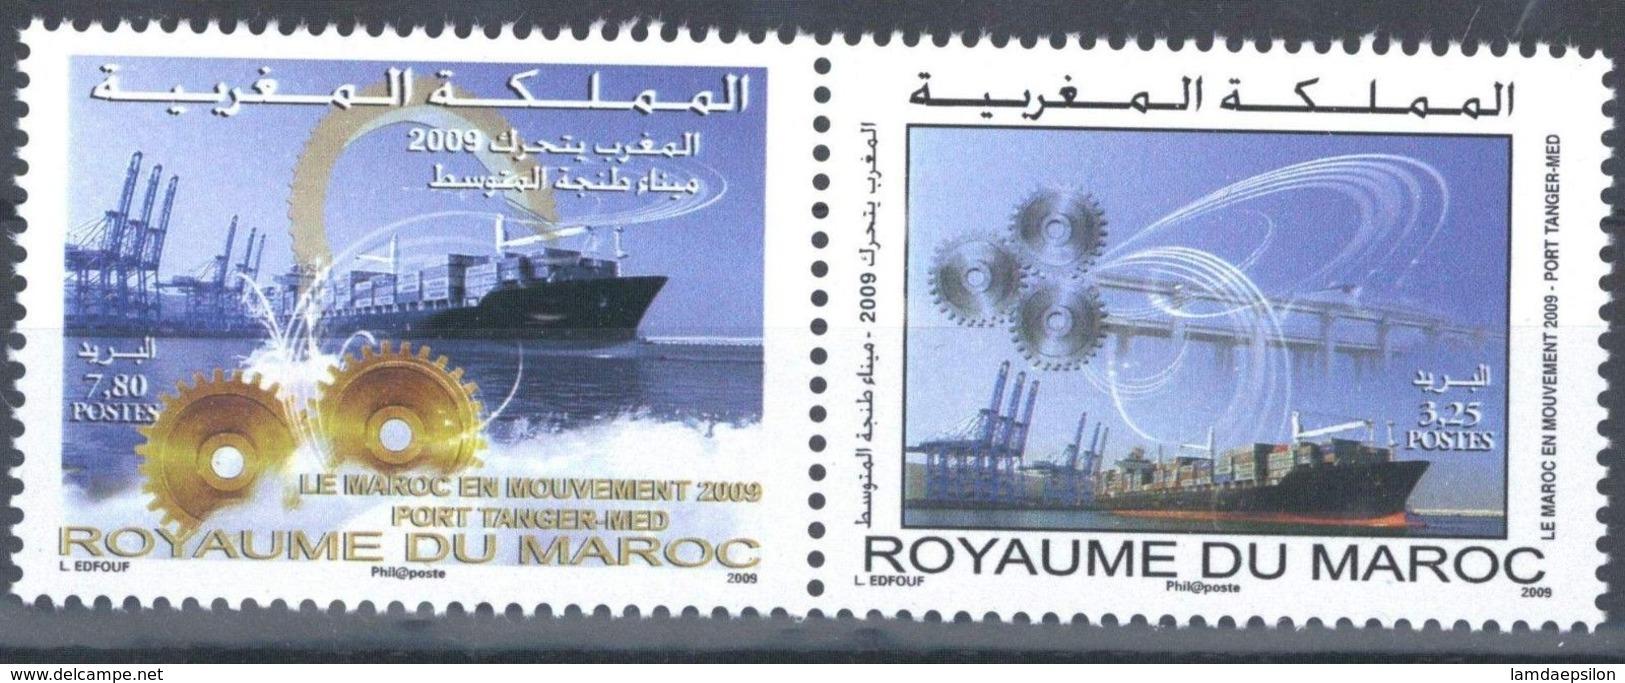 MOROCCO LE MAROC EN MOUVEMENT - PORT TANGER MED 2009 - Morocco (1956-...)